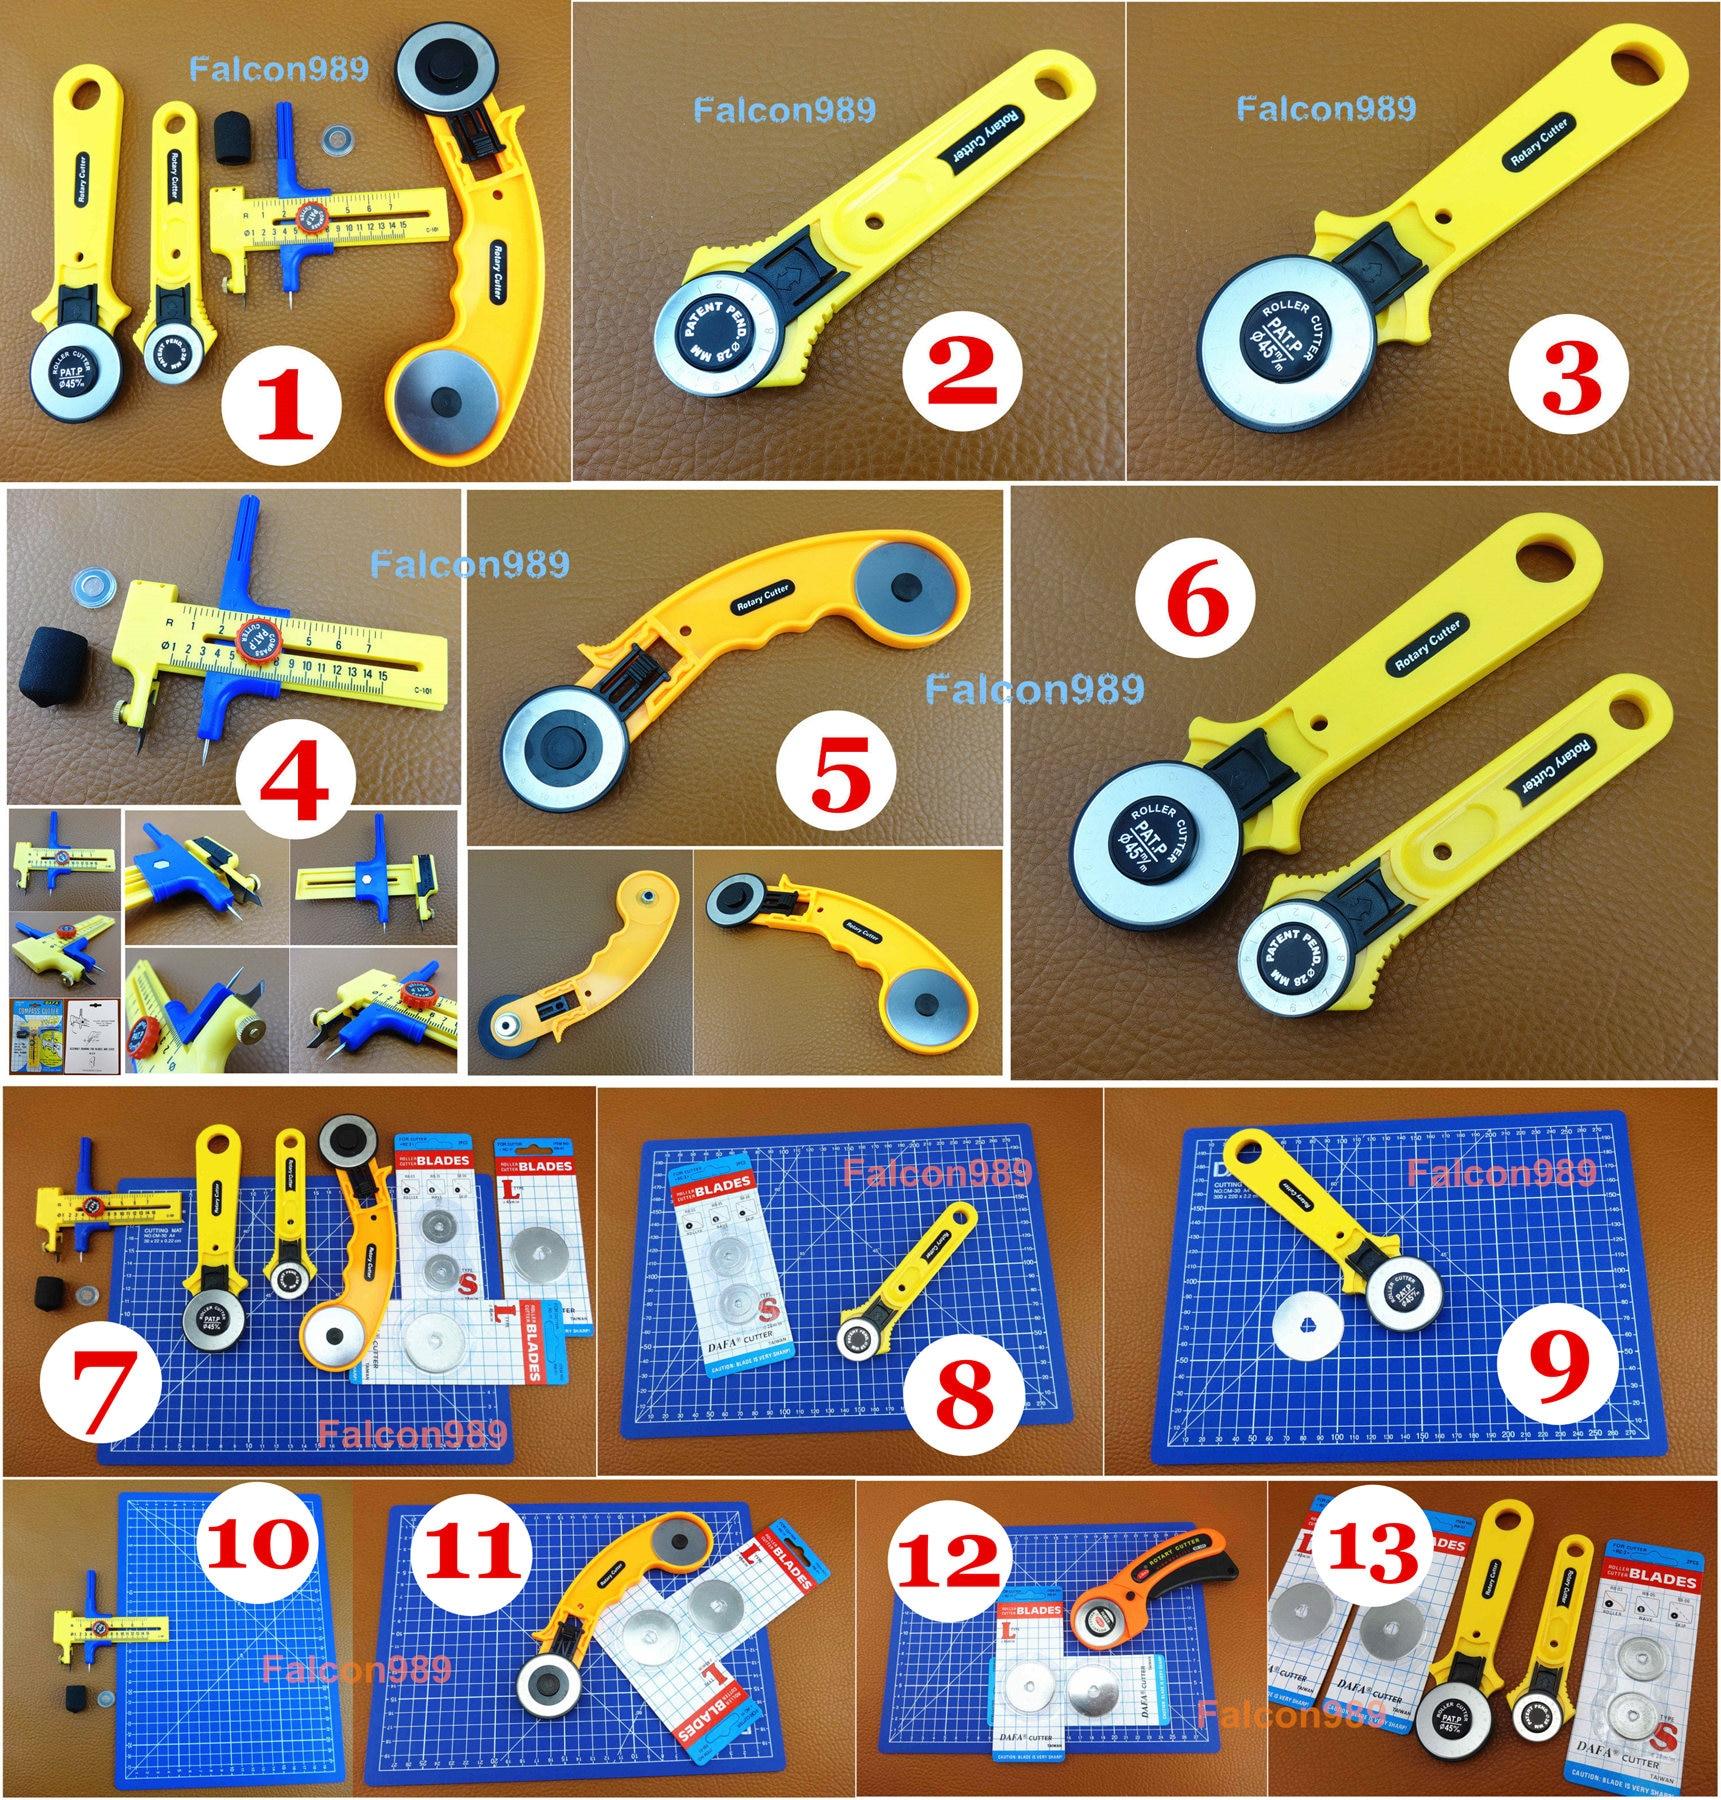 A4 Cutting Mat Leather Craft Tool Set Kit Cutter Circle Compass Cutter W